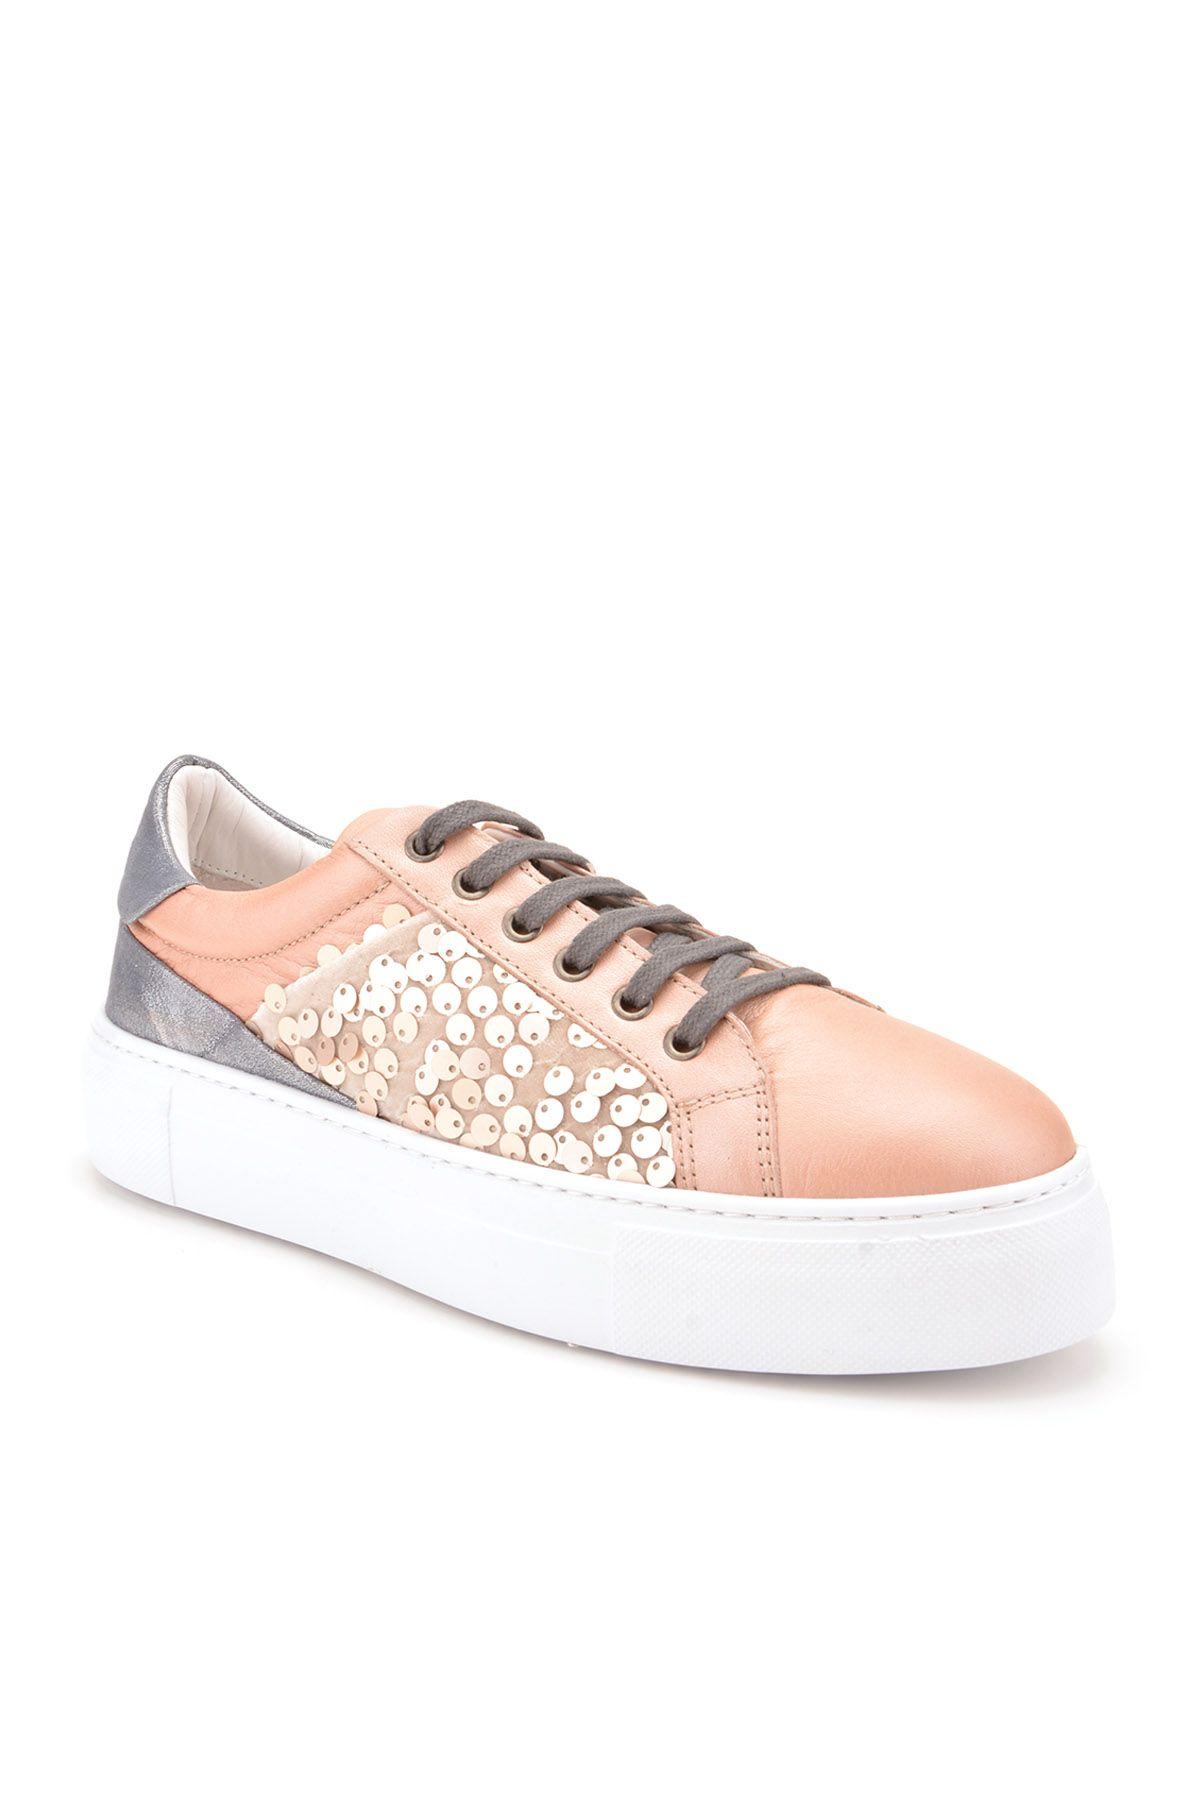 Pegia Blanche Hakiki Deri Bayan Spor Ayakkabı REC-002 Pudra